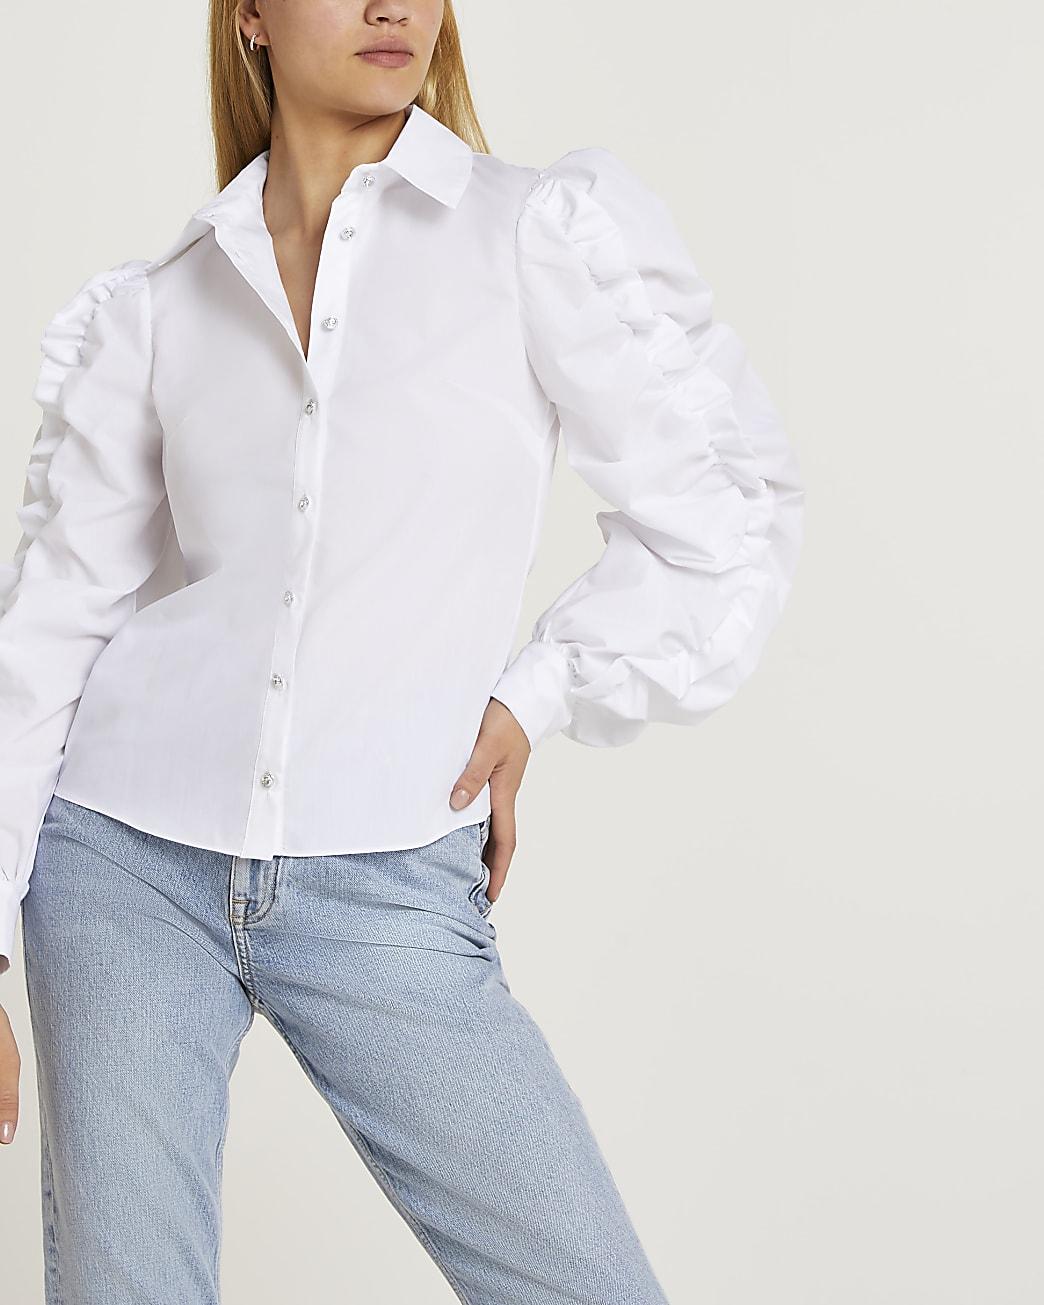 White ruched shirt